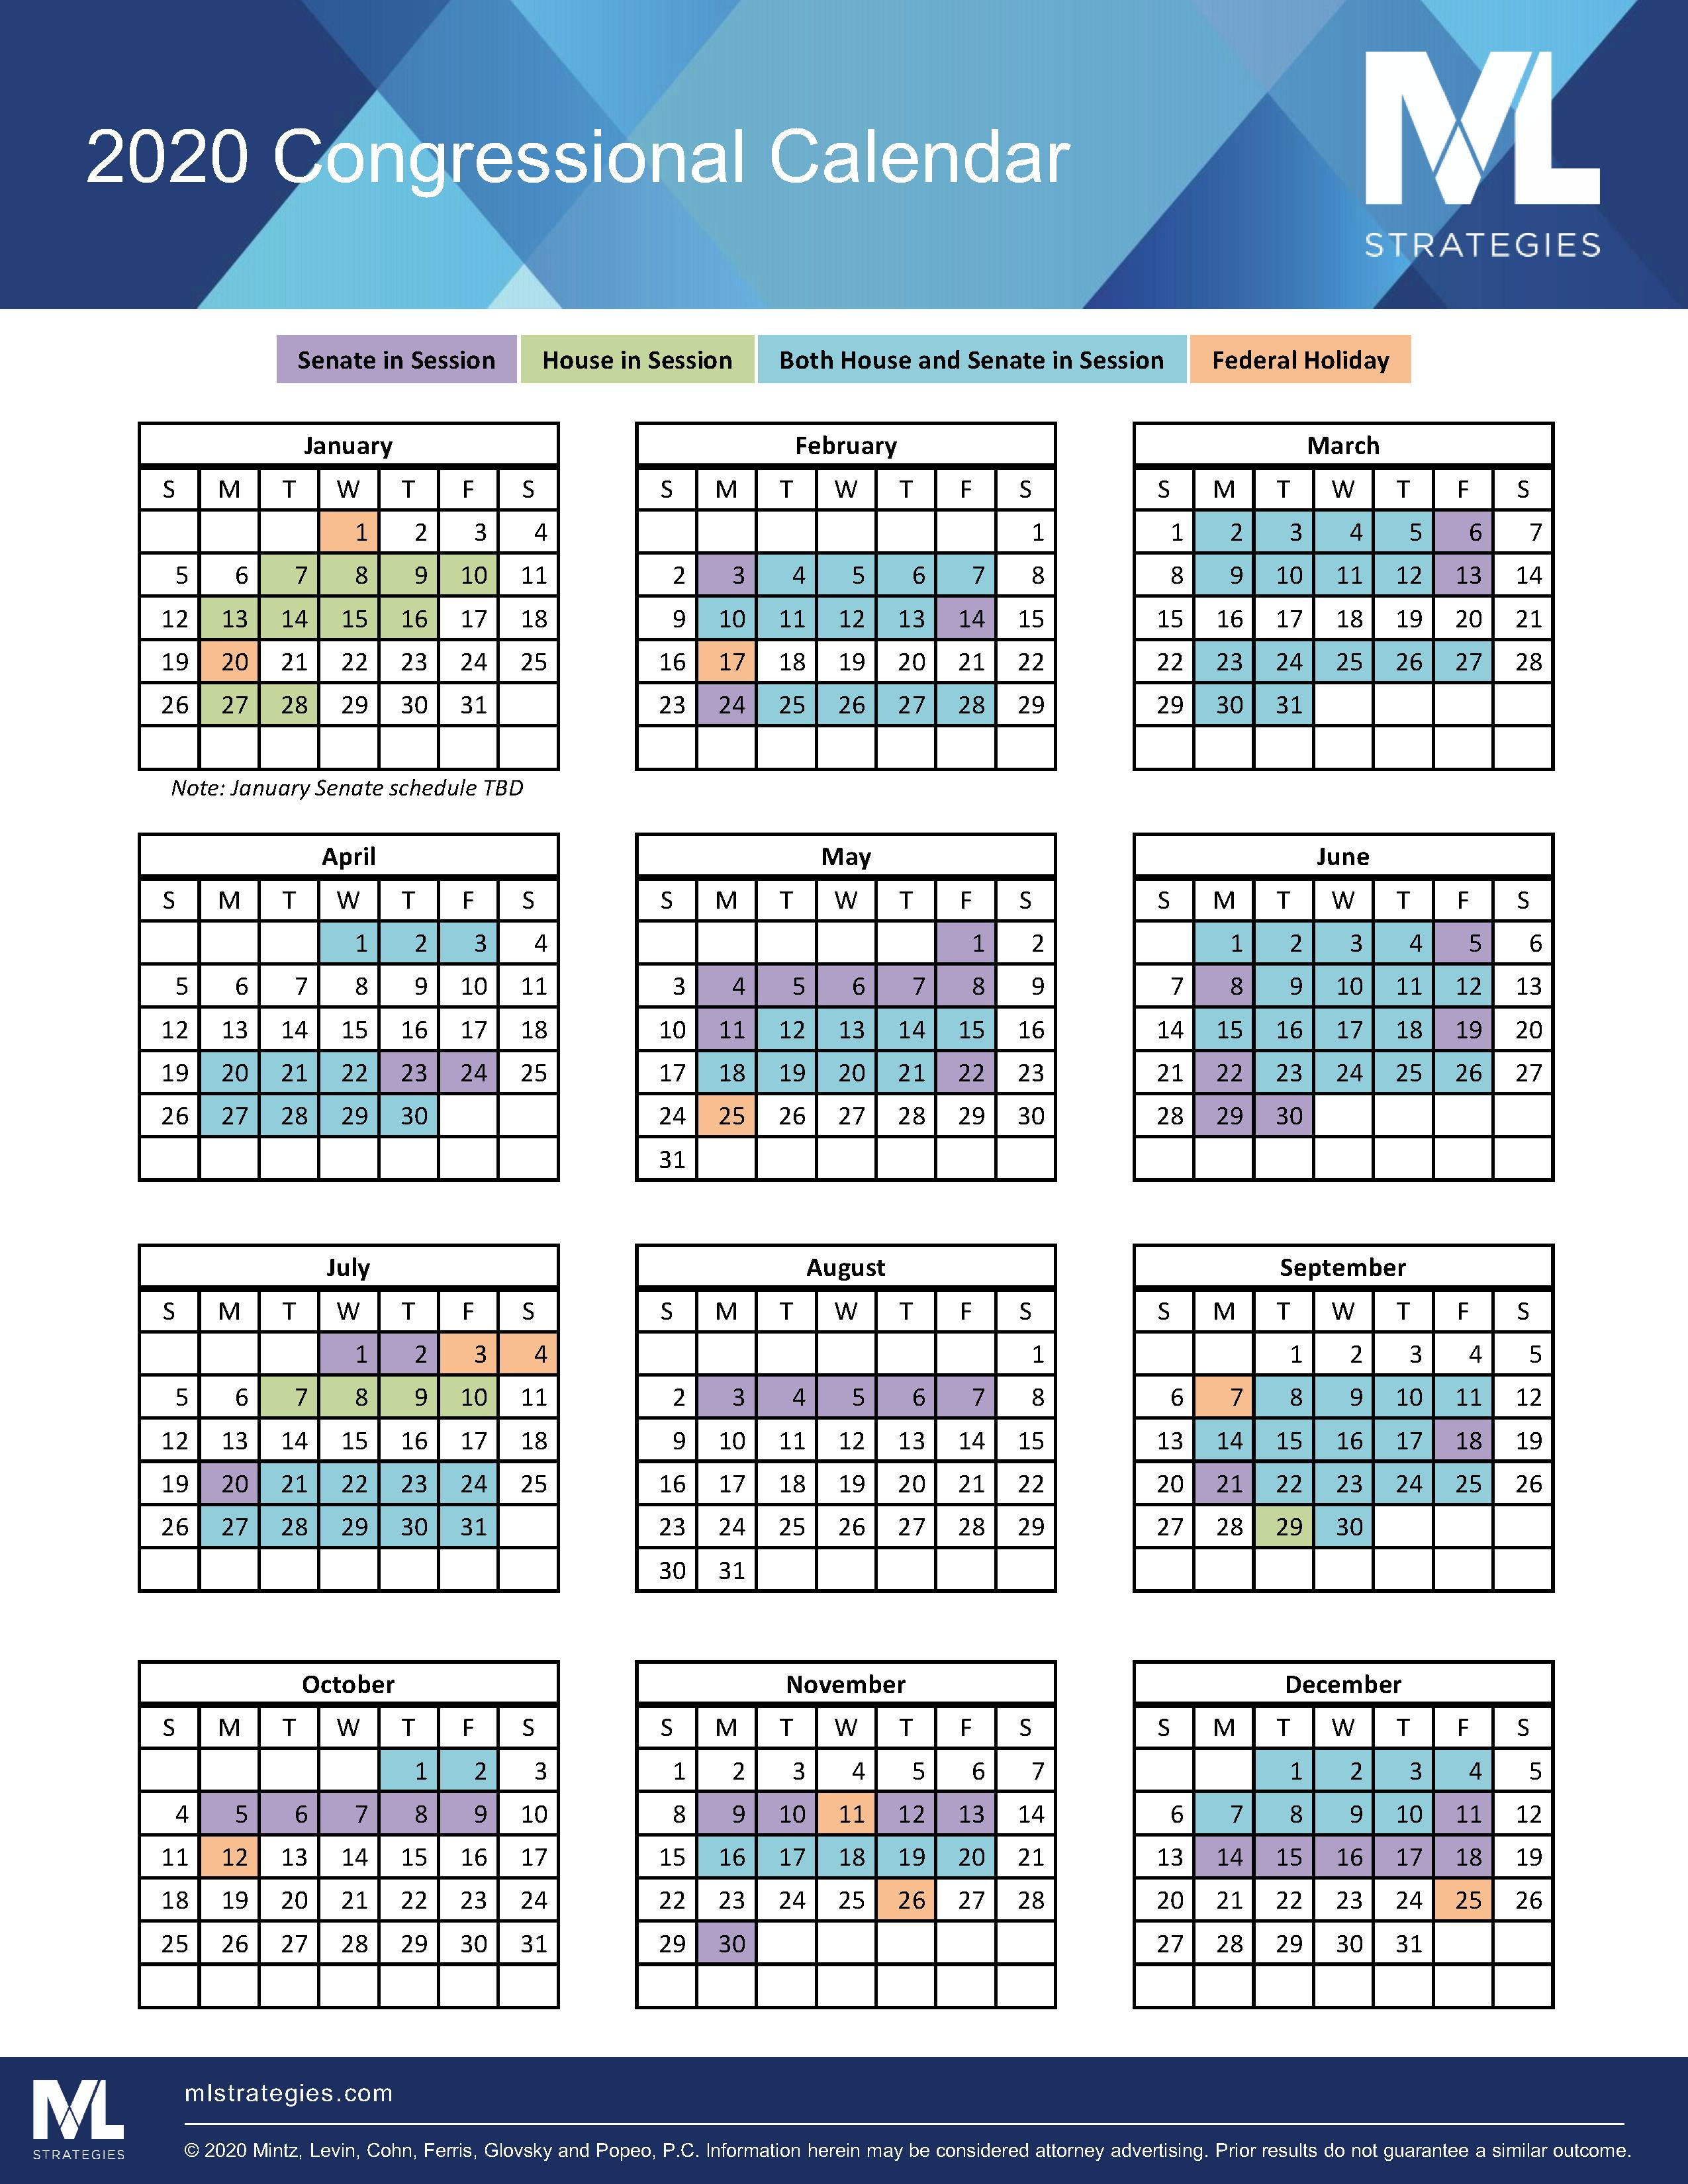 Congressional Calendar 2021 2020 Congressional Highlights | Mintz